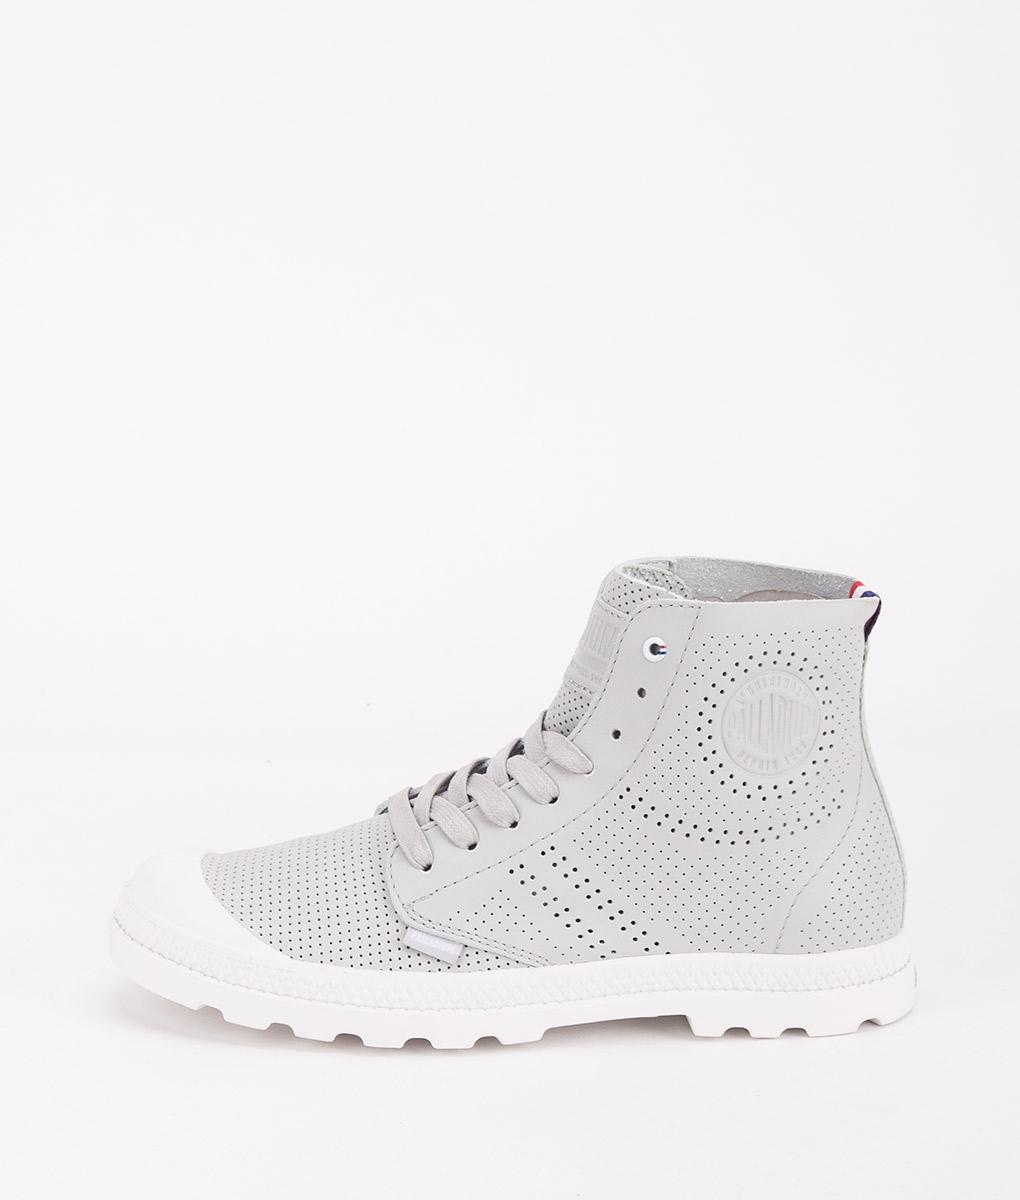 PALLADIUM Women Sneakers 95756 PAMPA MID LP, Vapor 99.99